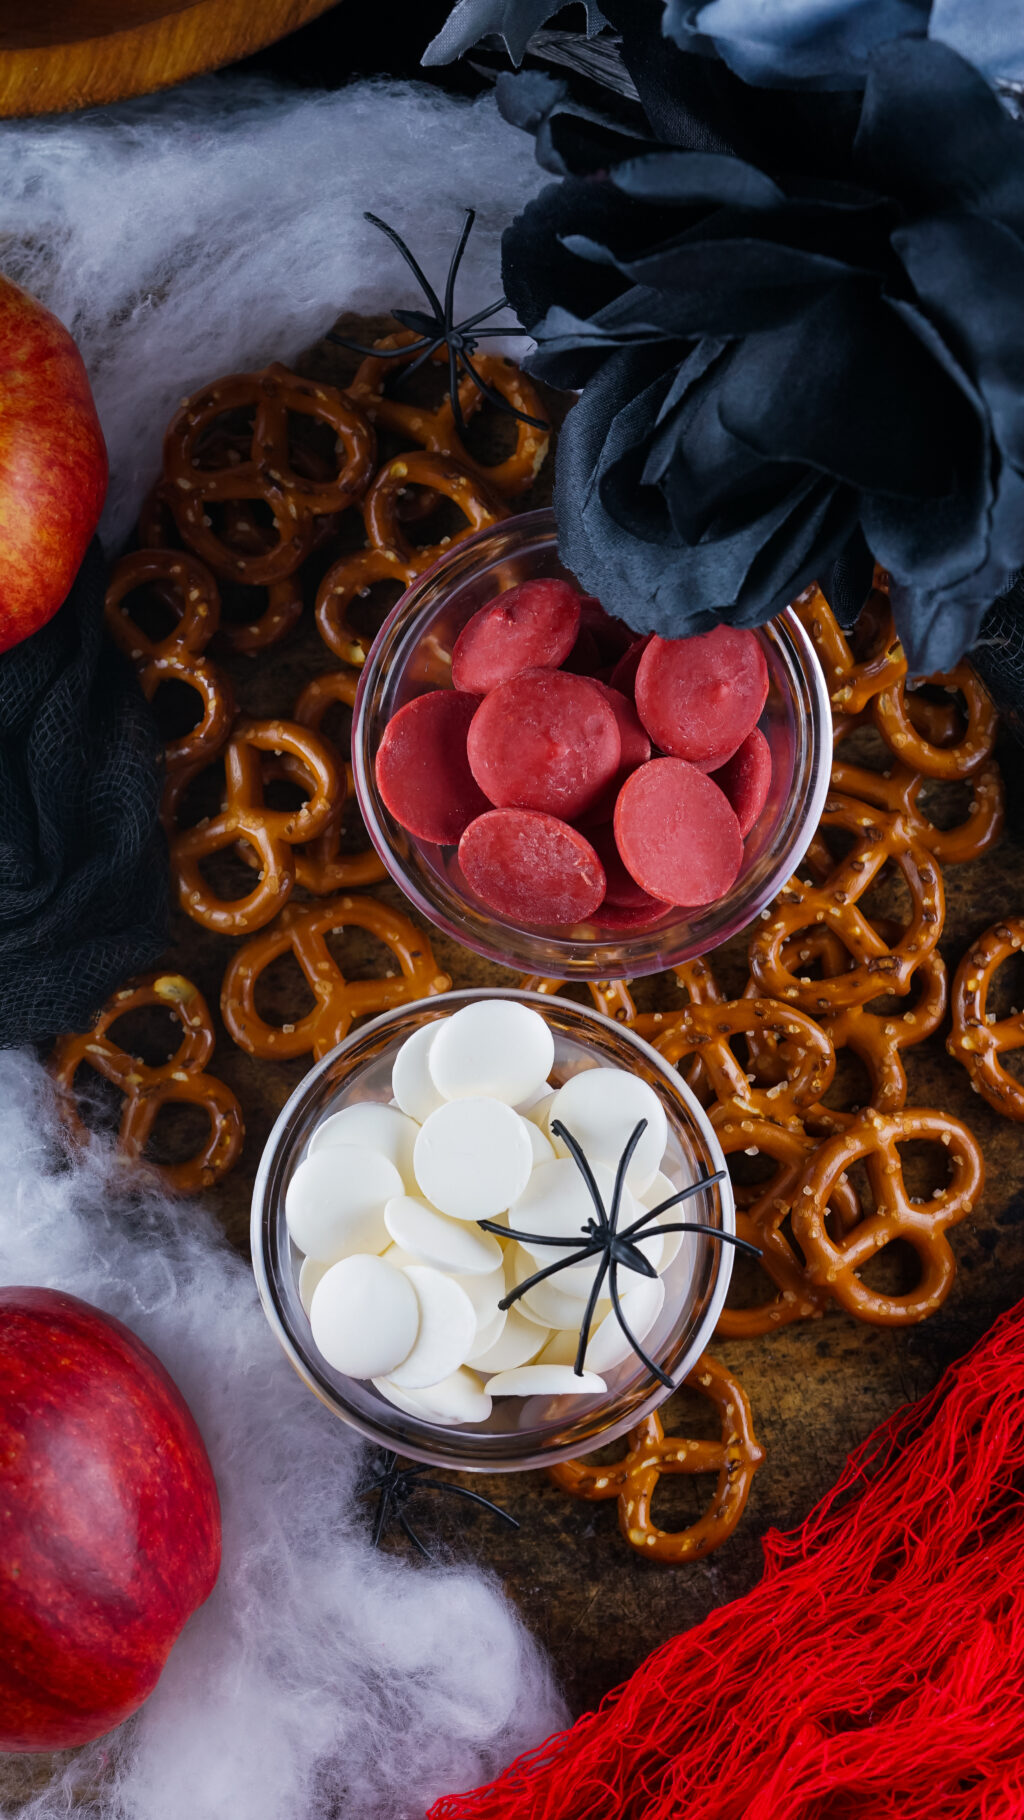 bloody pretzel ingredients on a table